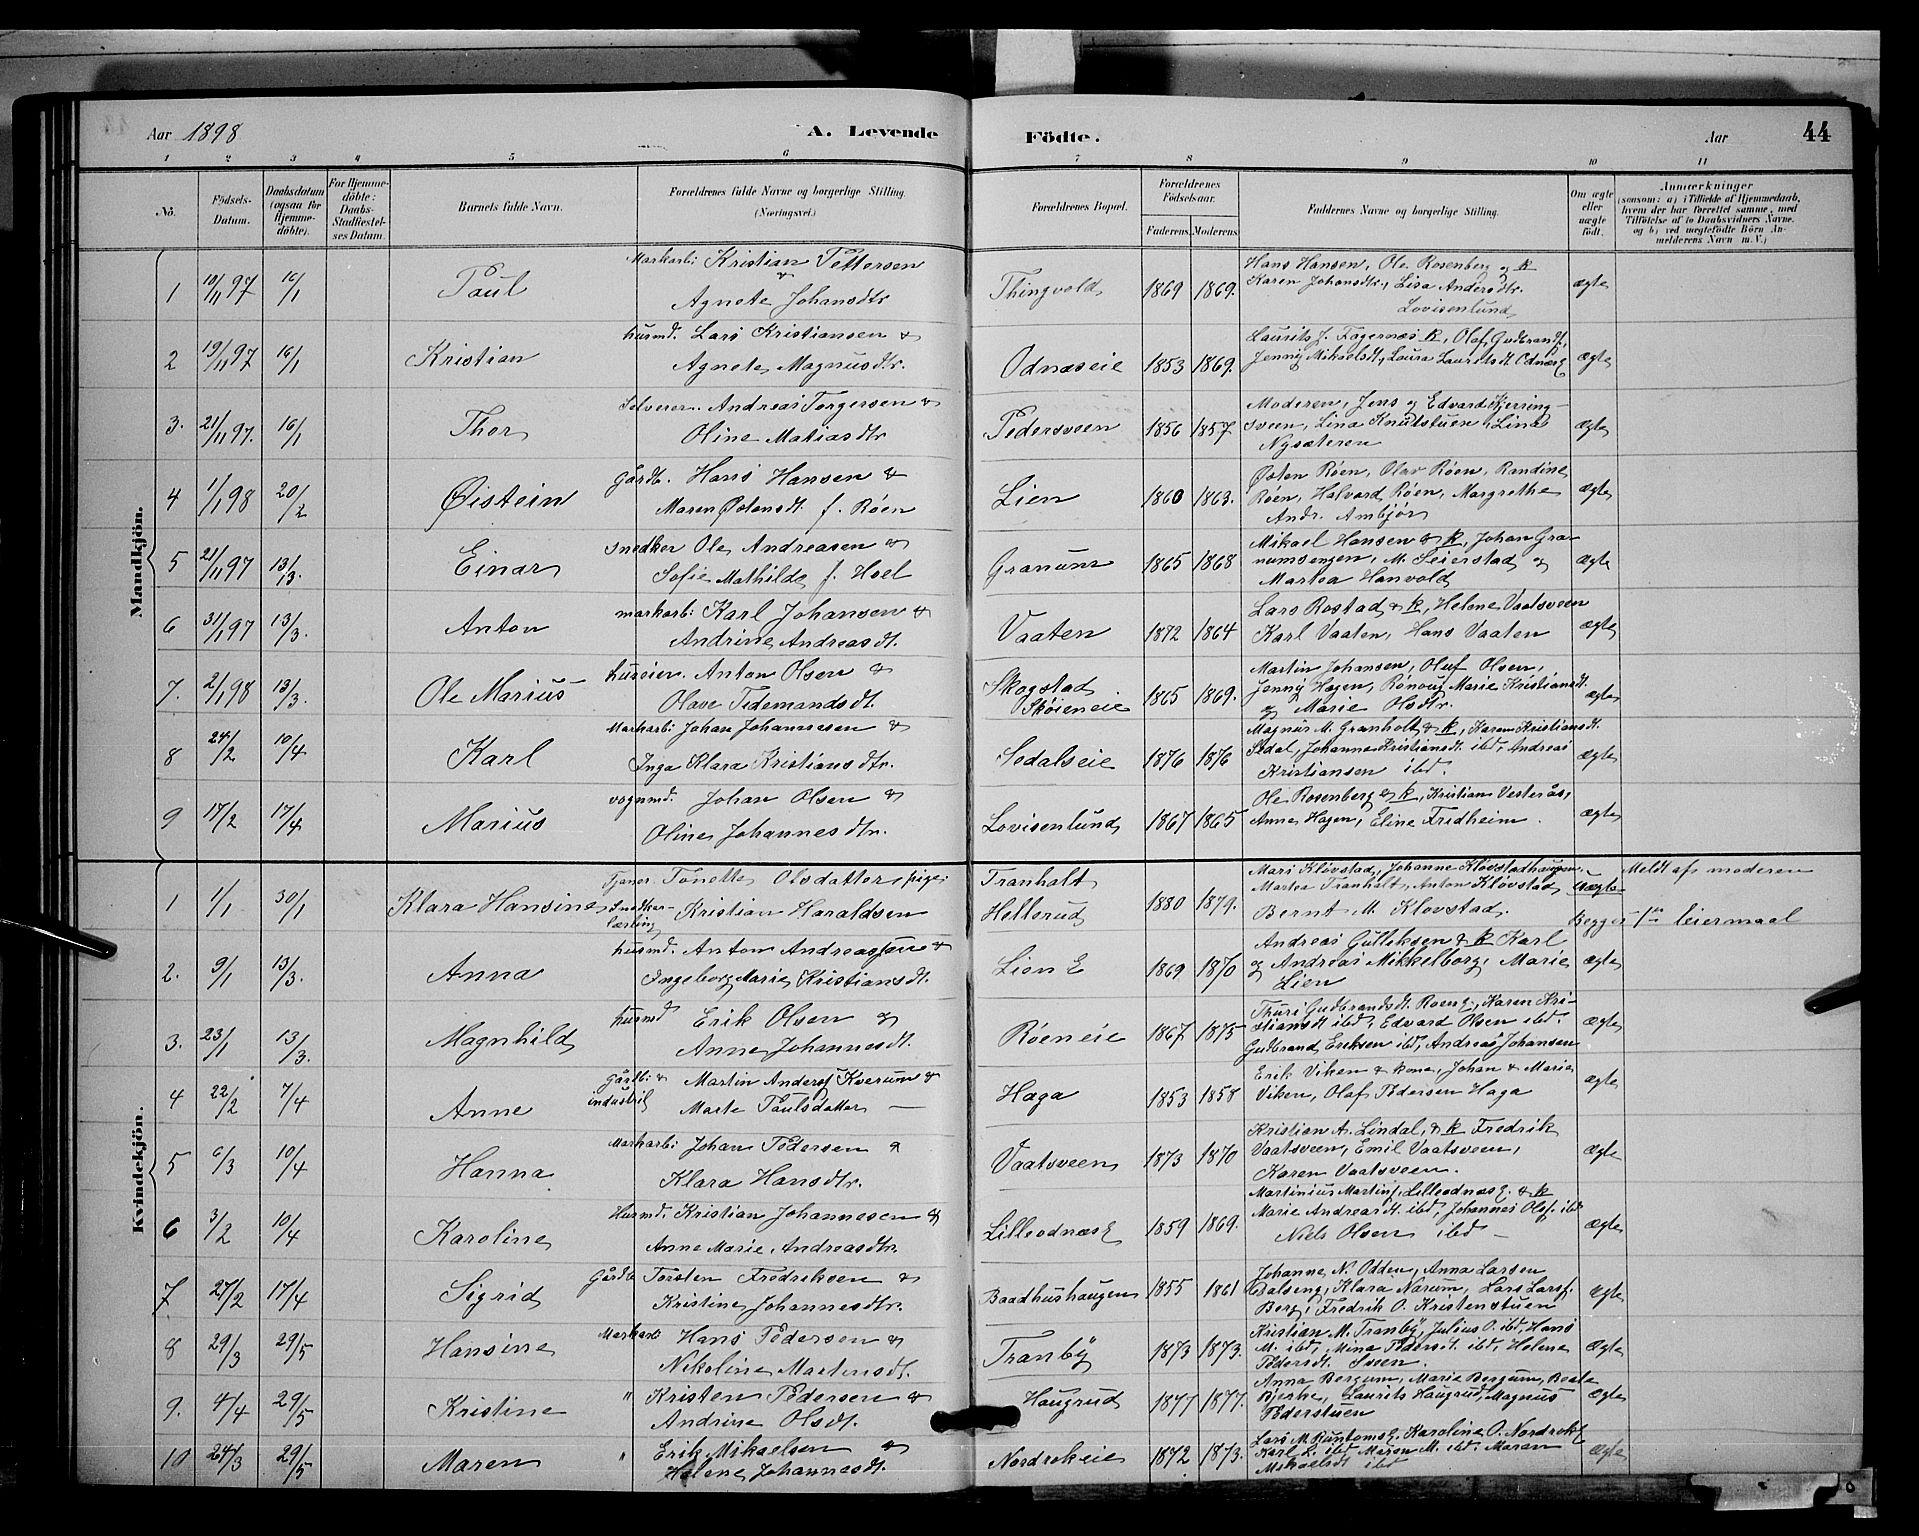 SAH, Søndre Land prestekontor, L/L0003: Klokkerbok nr. 3, 1884-1902, s. 44